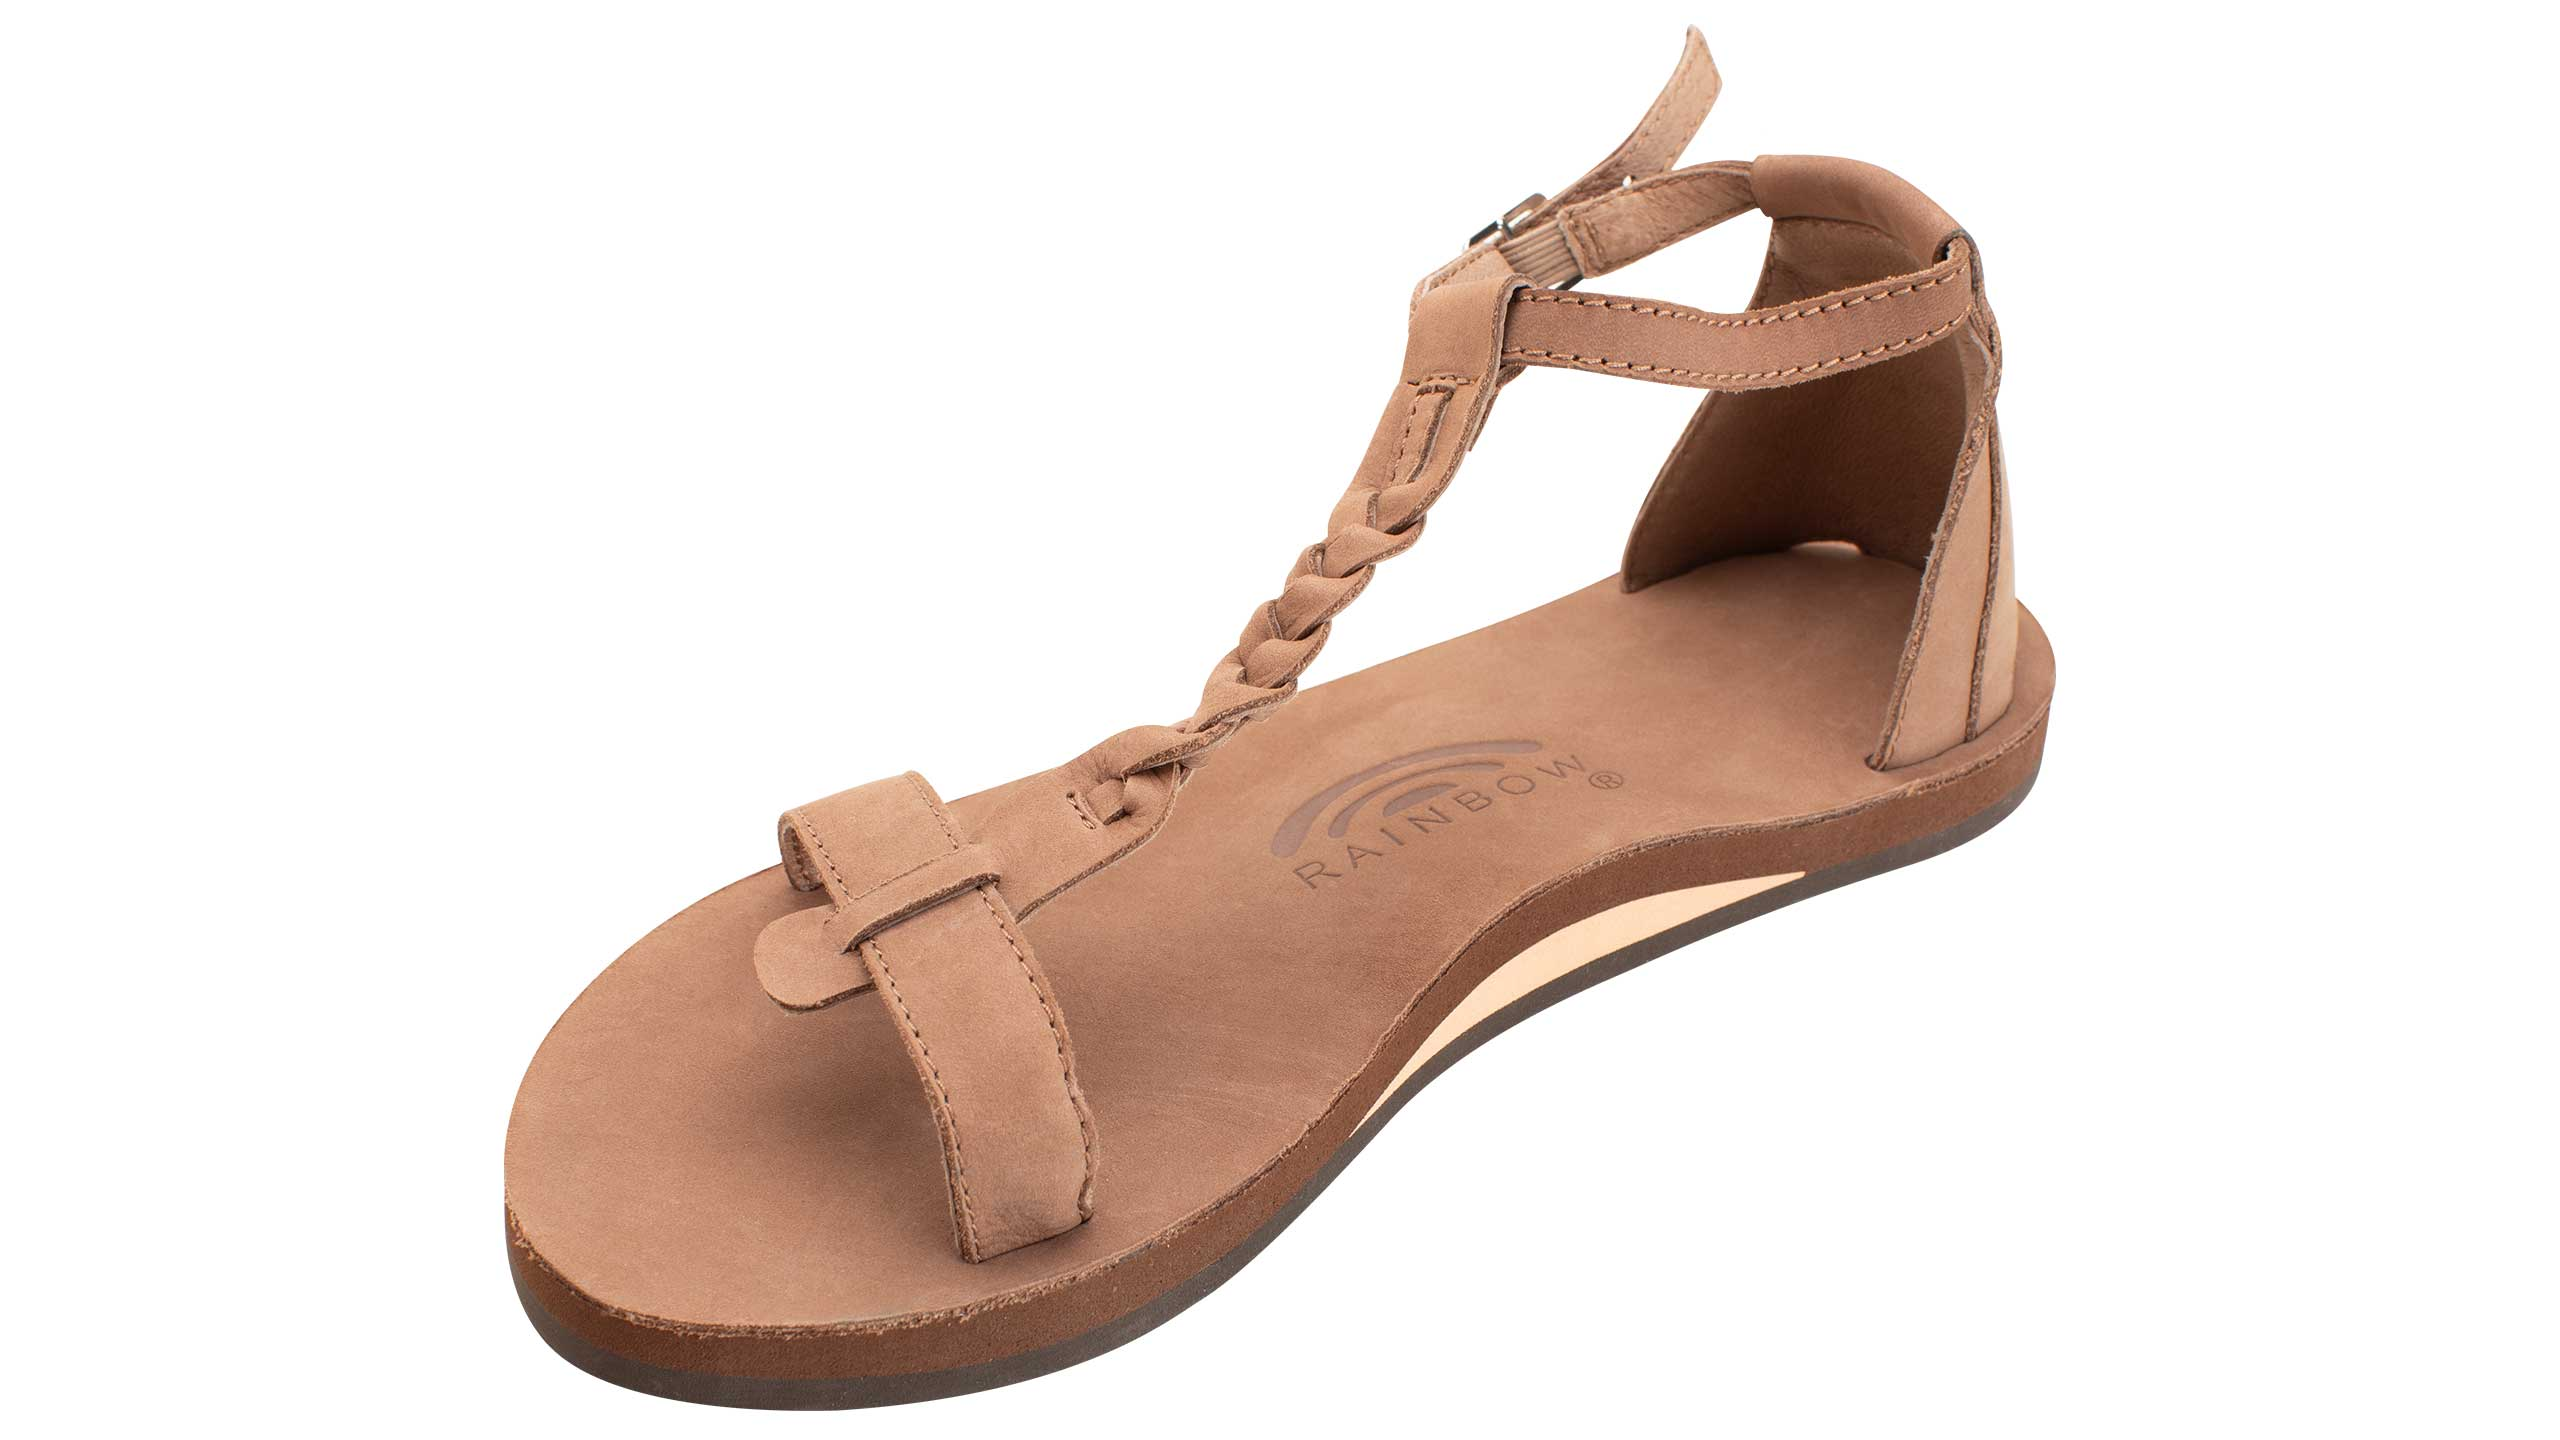 NEW WOMEN RAINBOW SANDAL CALAFIAO DARK BROWN FOOT LOOP SANDALS